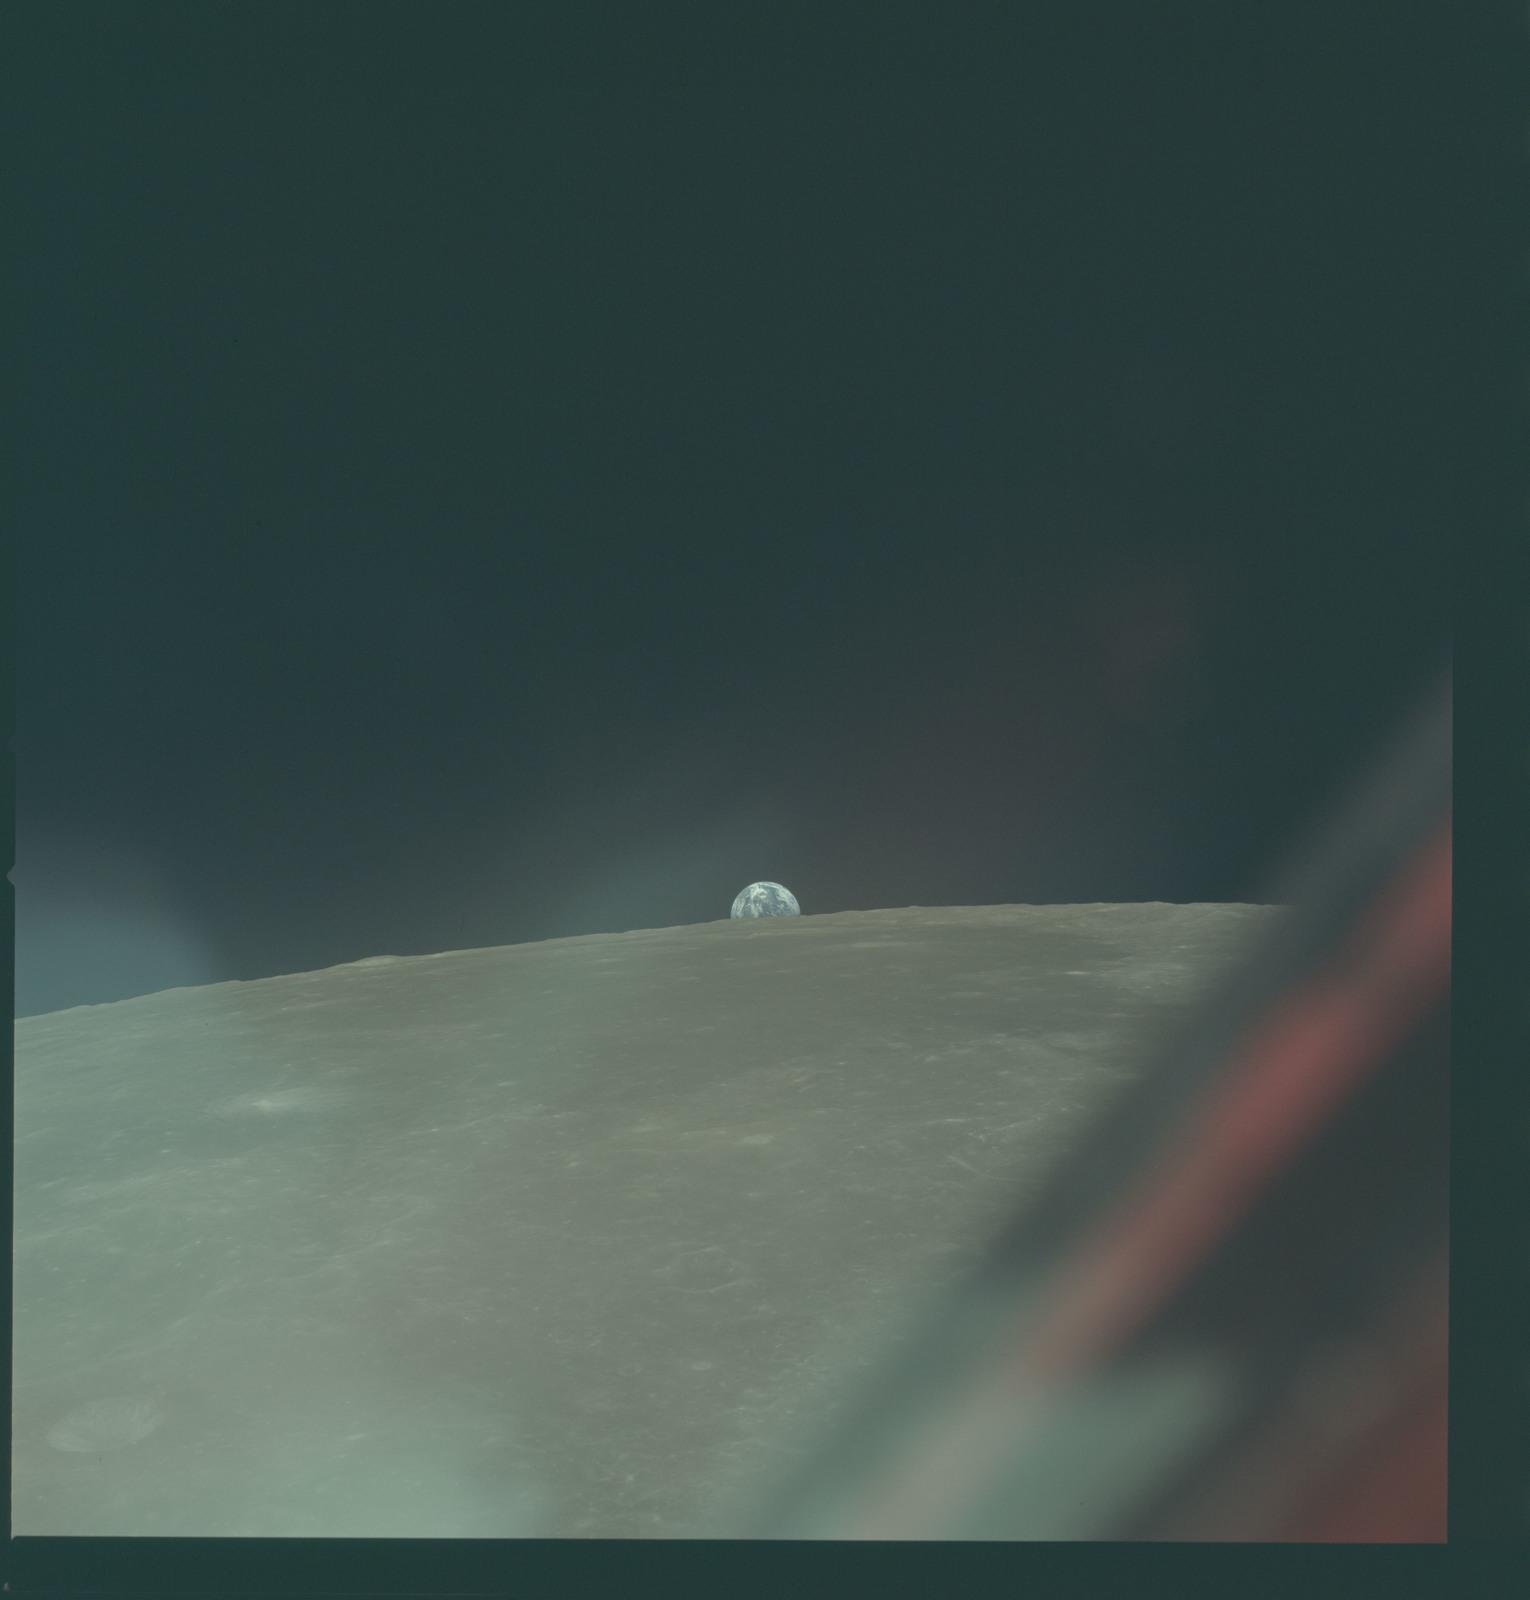 AS11-44-6602 - Apollo 11 - Apollo 11 Mission image - View of Moon limb with Earth on the horizon